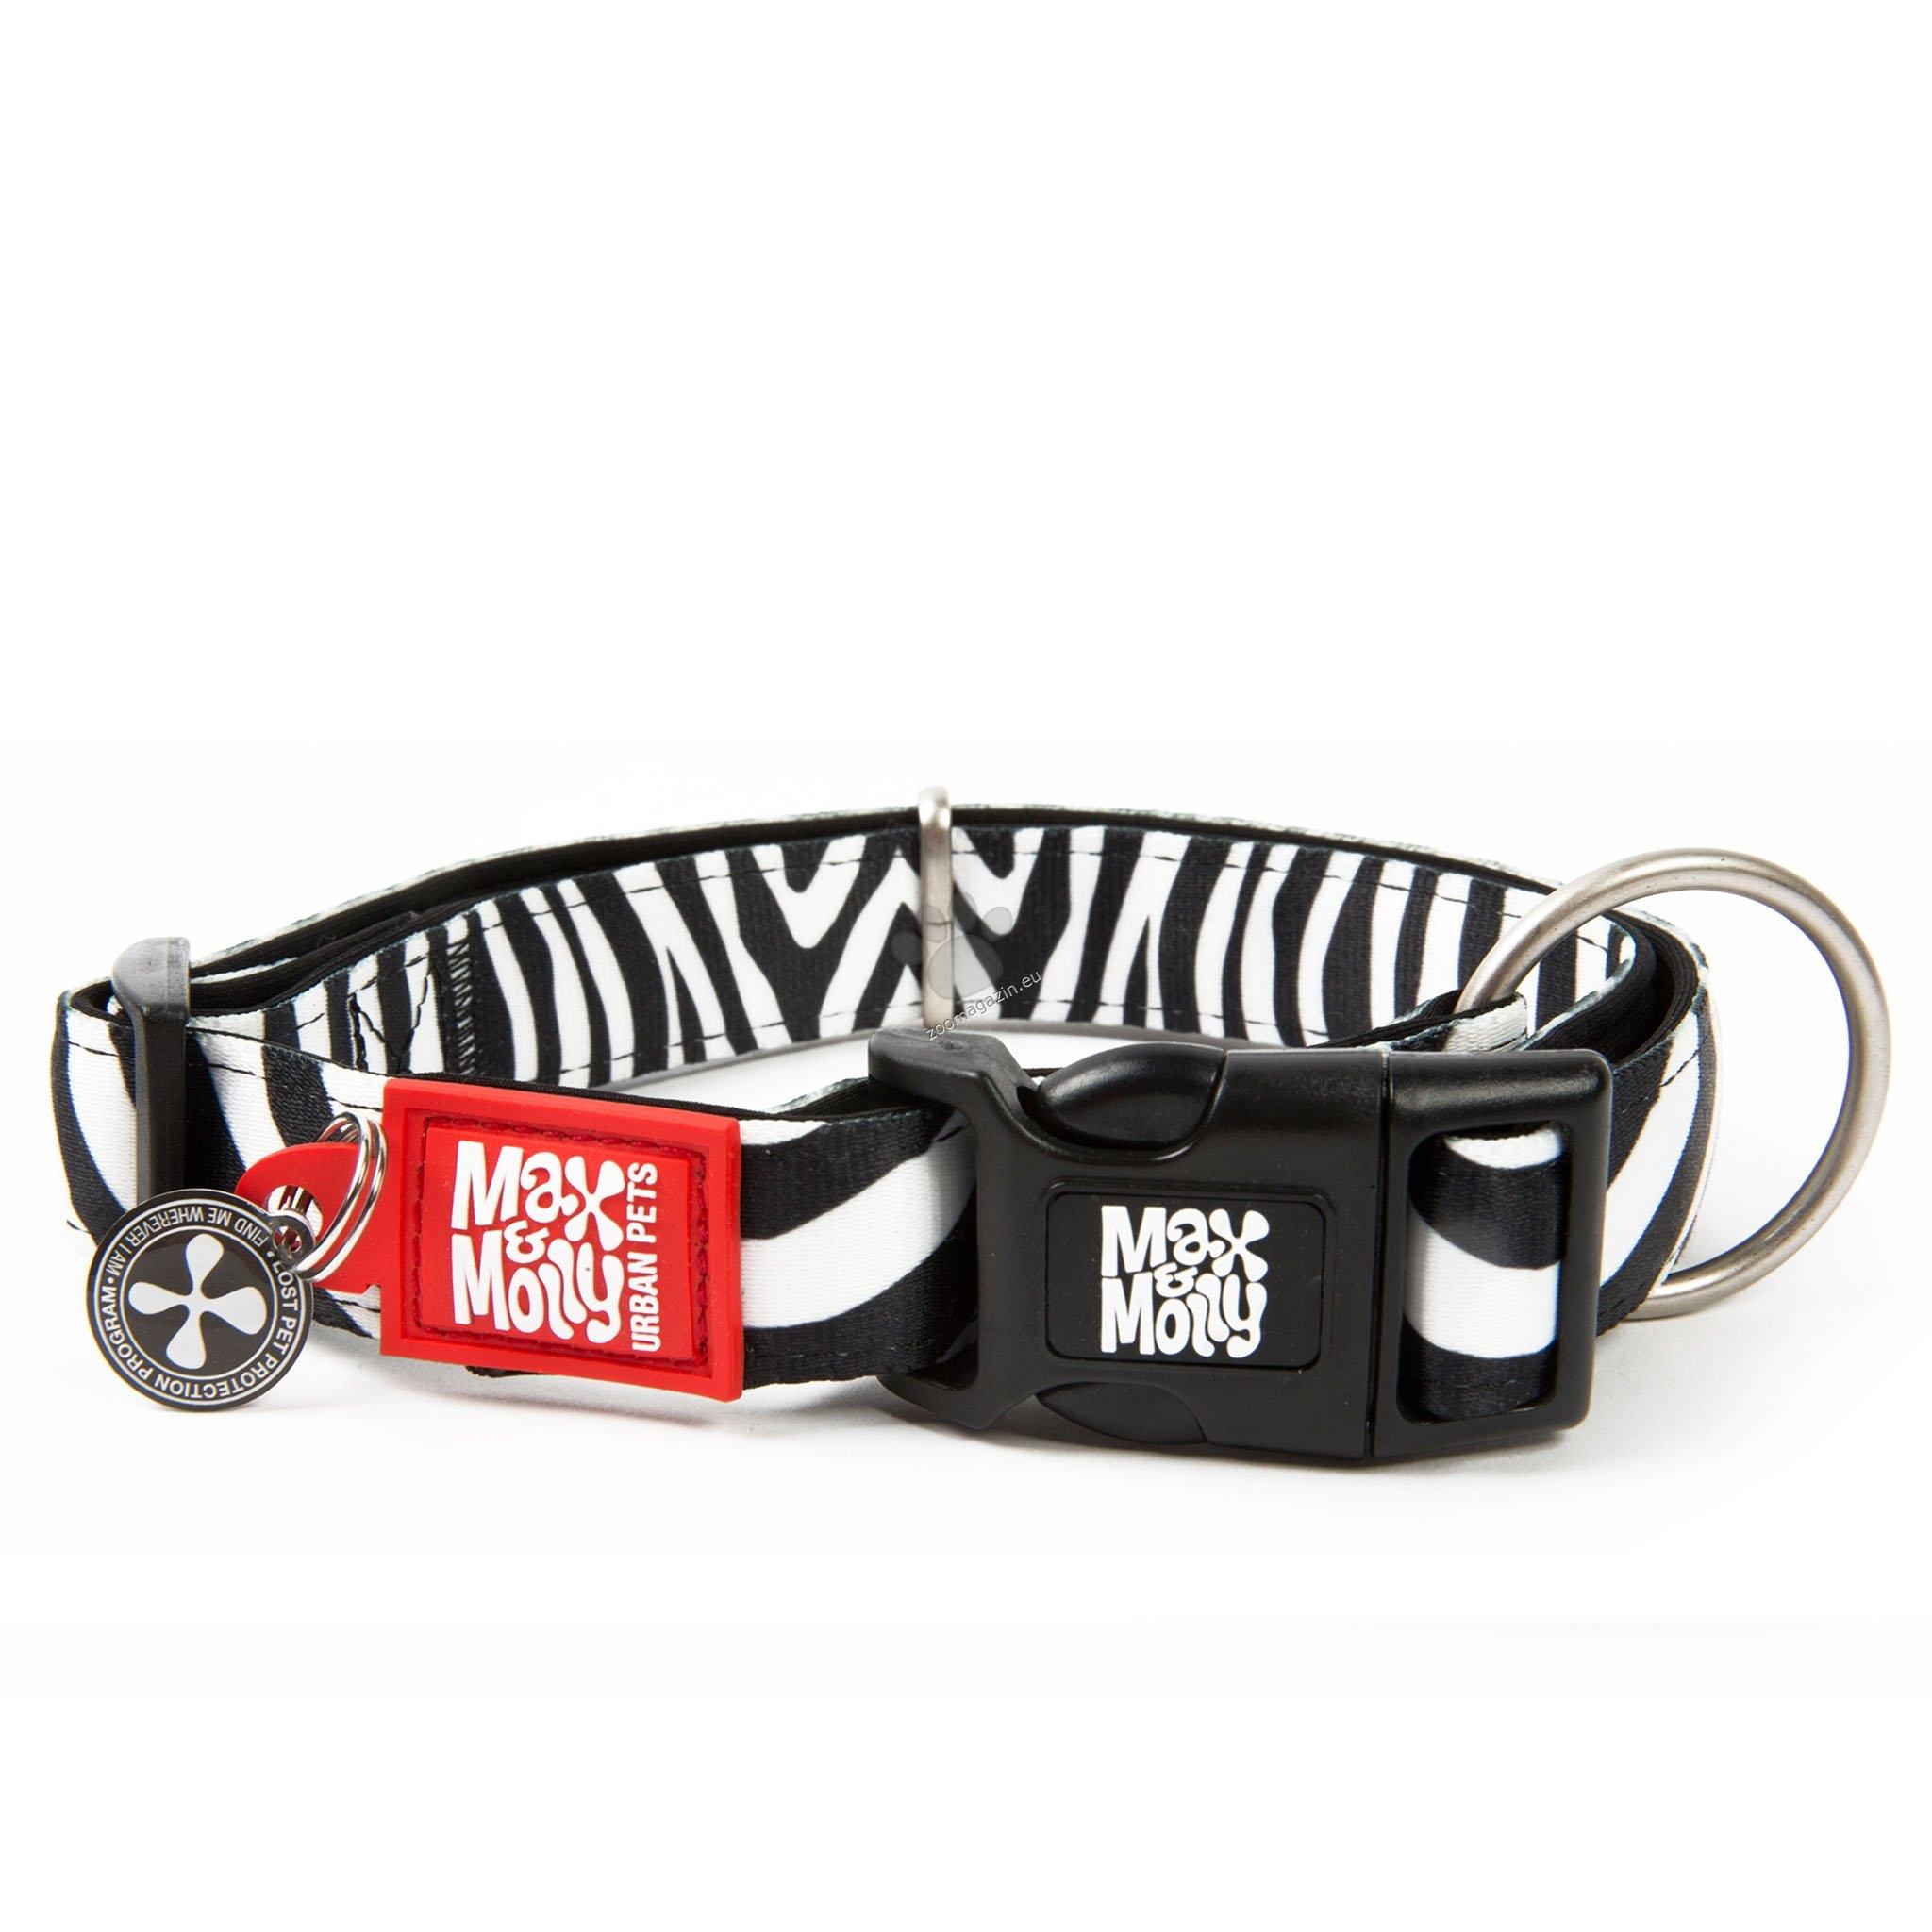 Max Molly Smart ID Zebra М - нашийник с ID чип за сигурност 34 - 55 см. / 20 мм.